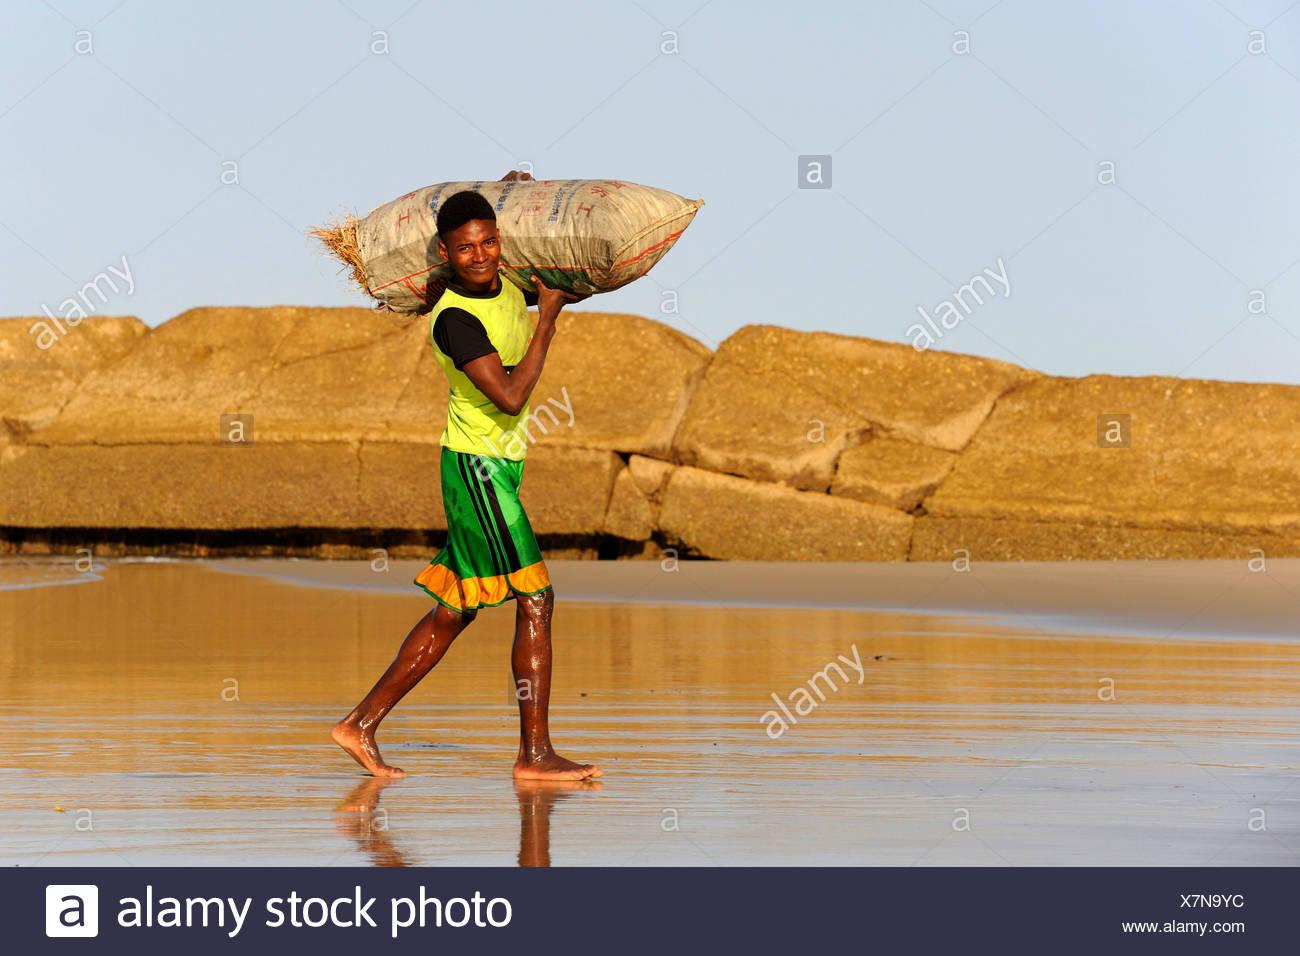 Jeune homme malgache portant un sac de charbon, Morondava, Madagascar, Afrique Photo Stock